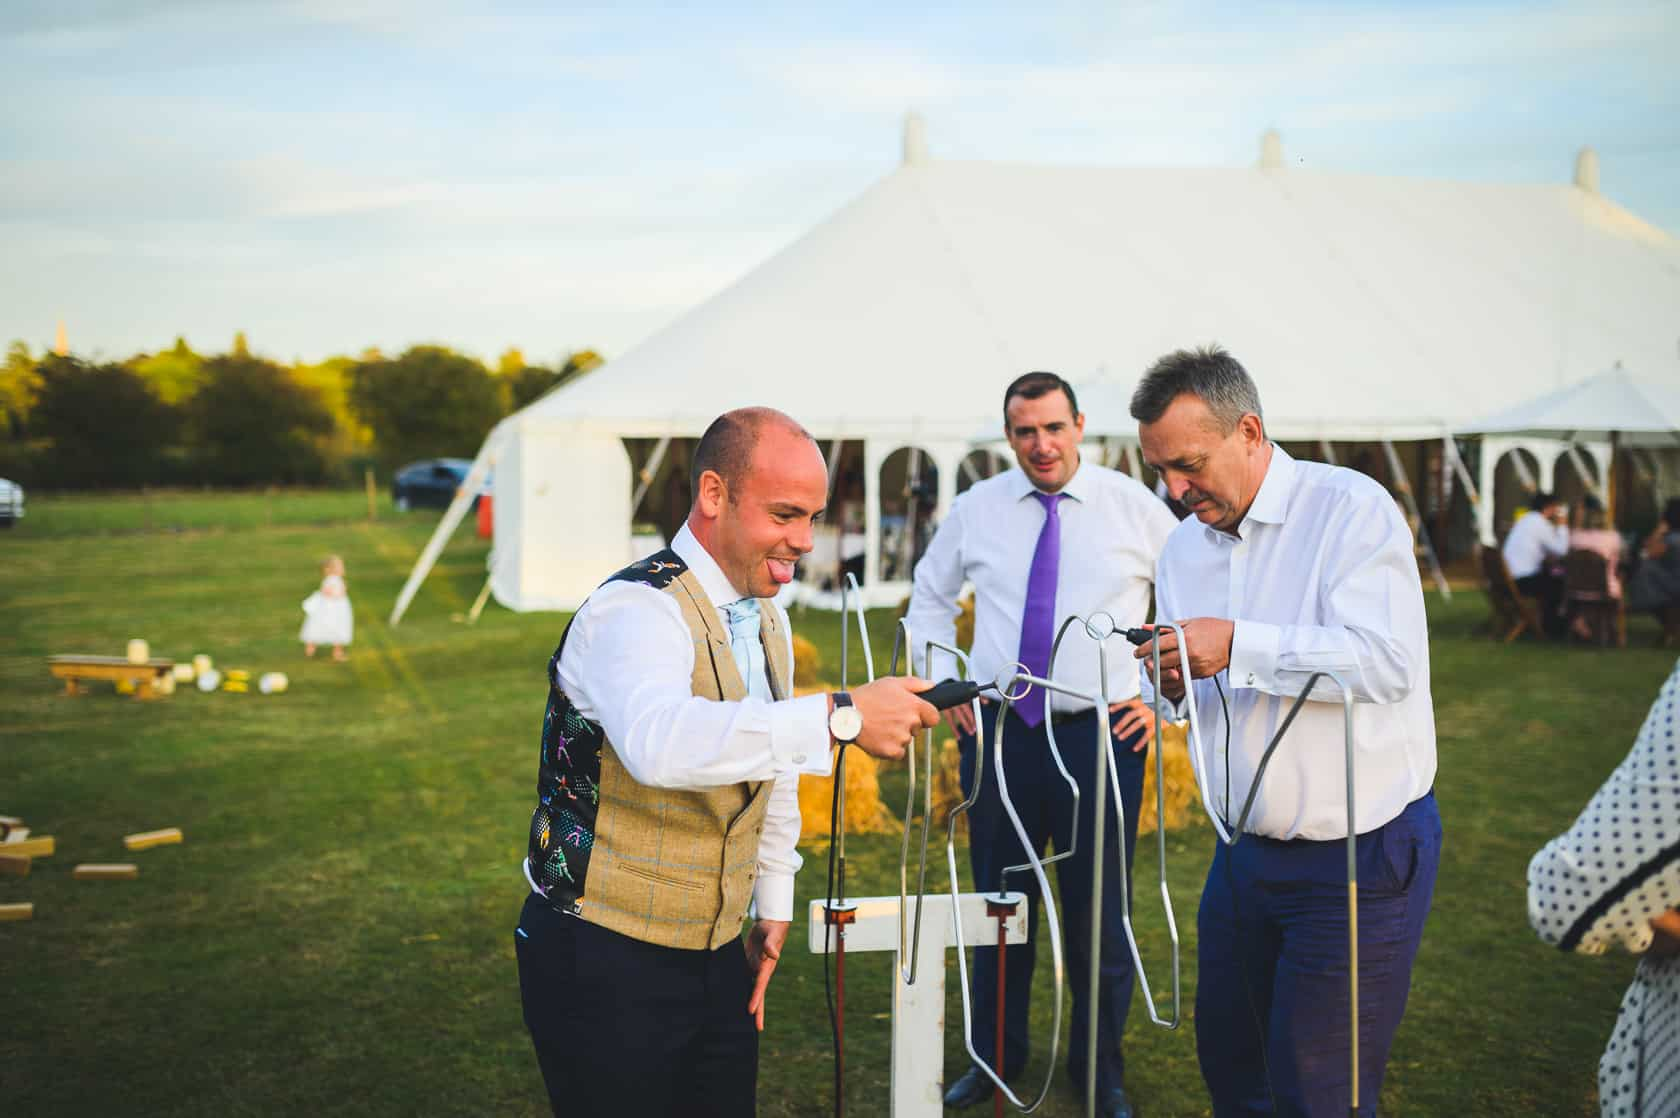 Best_Wedding_Photography_2019_Wedding-Photographer-Essex_107